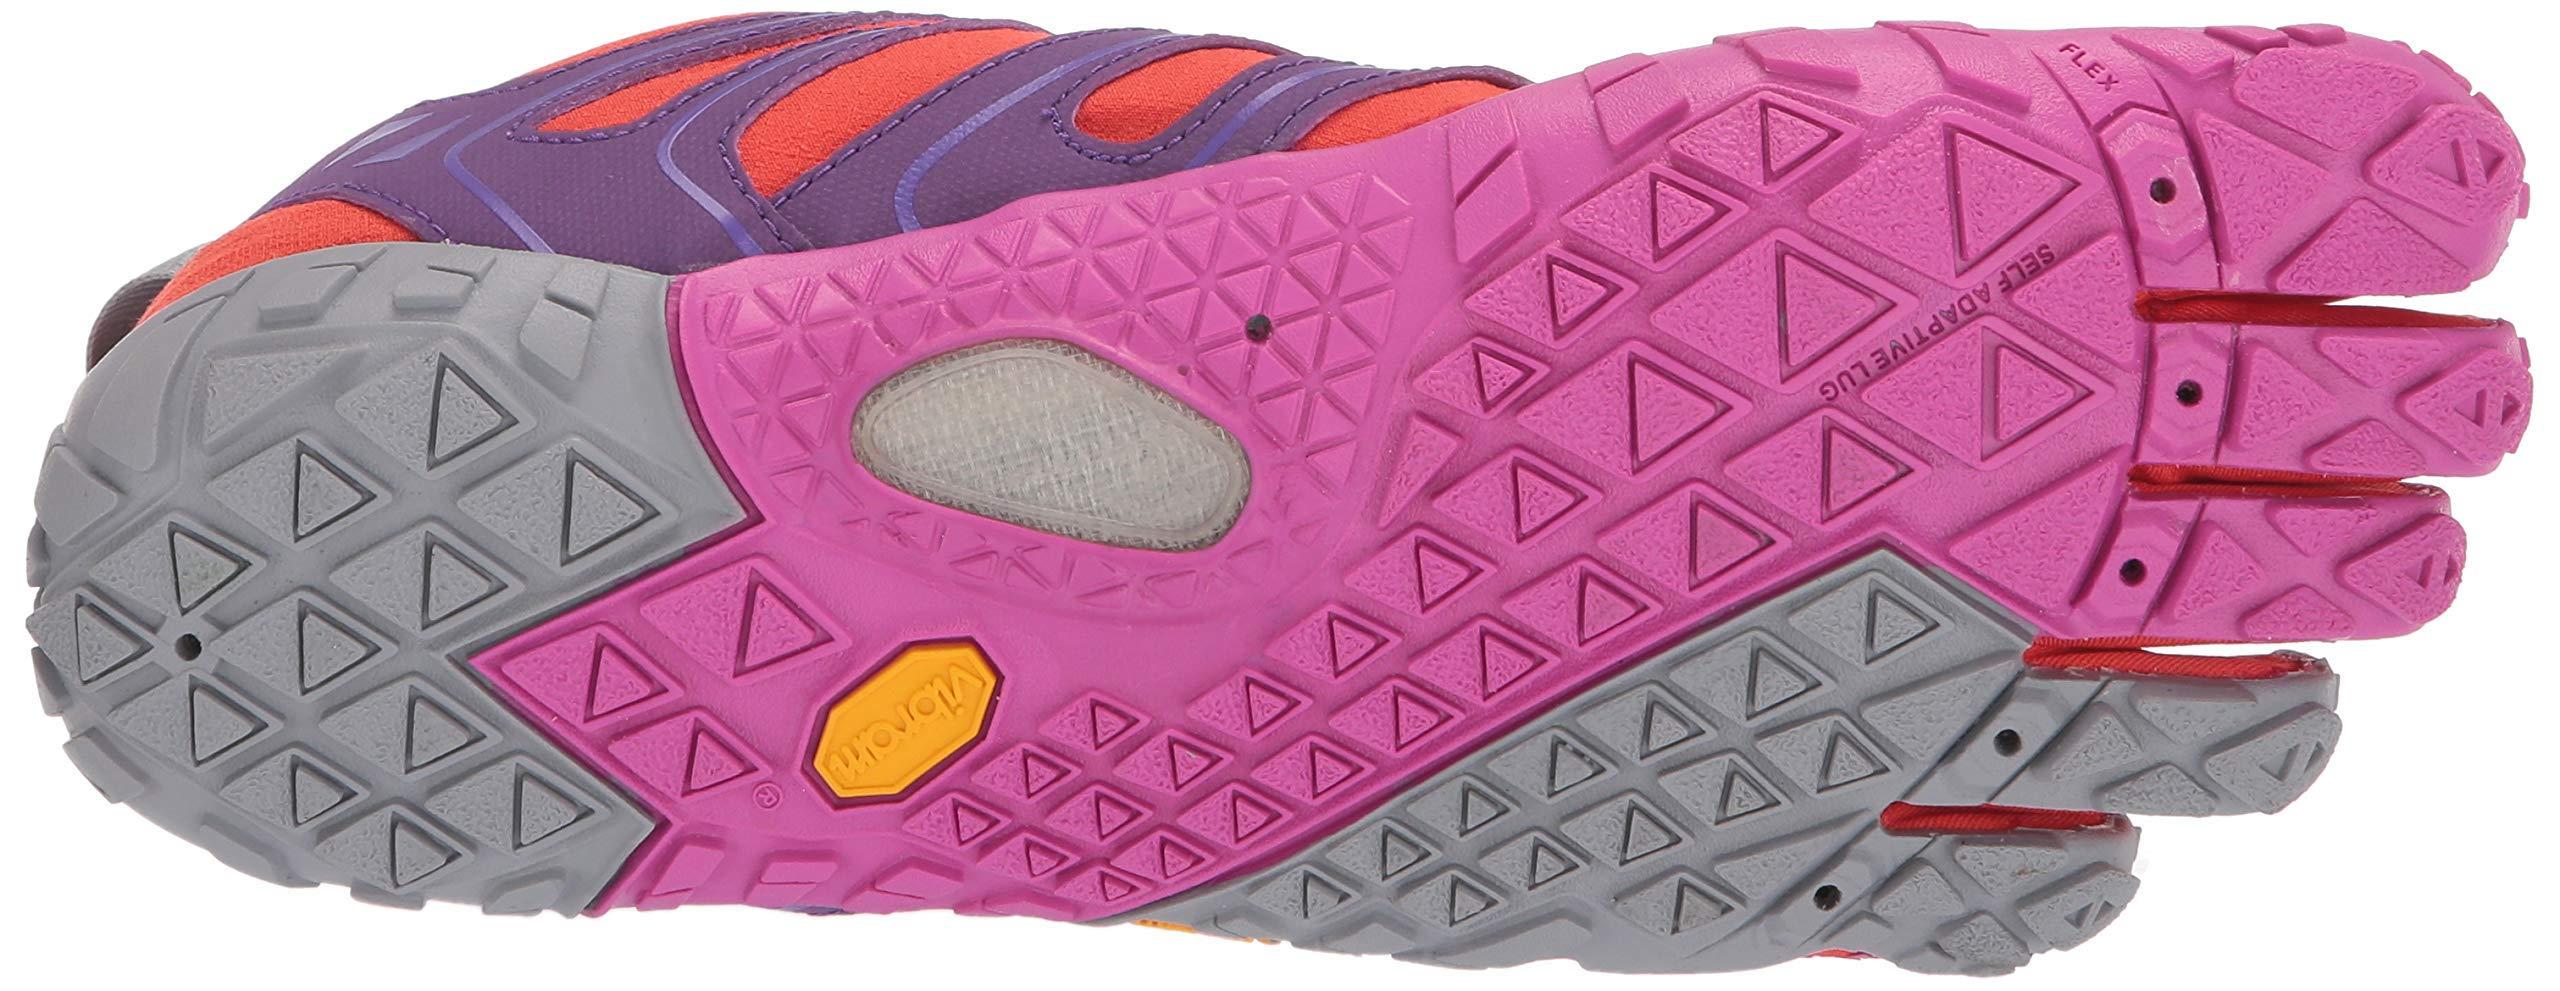 Vibram FiveFingers V-Trail, Women's Trail Running Shoes, Orange (Magenta/Orange), 7.5-8 UK (41 EU) by Vibram (Image #5)